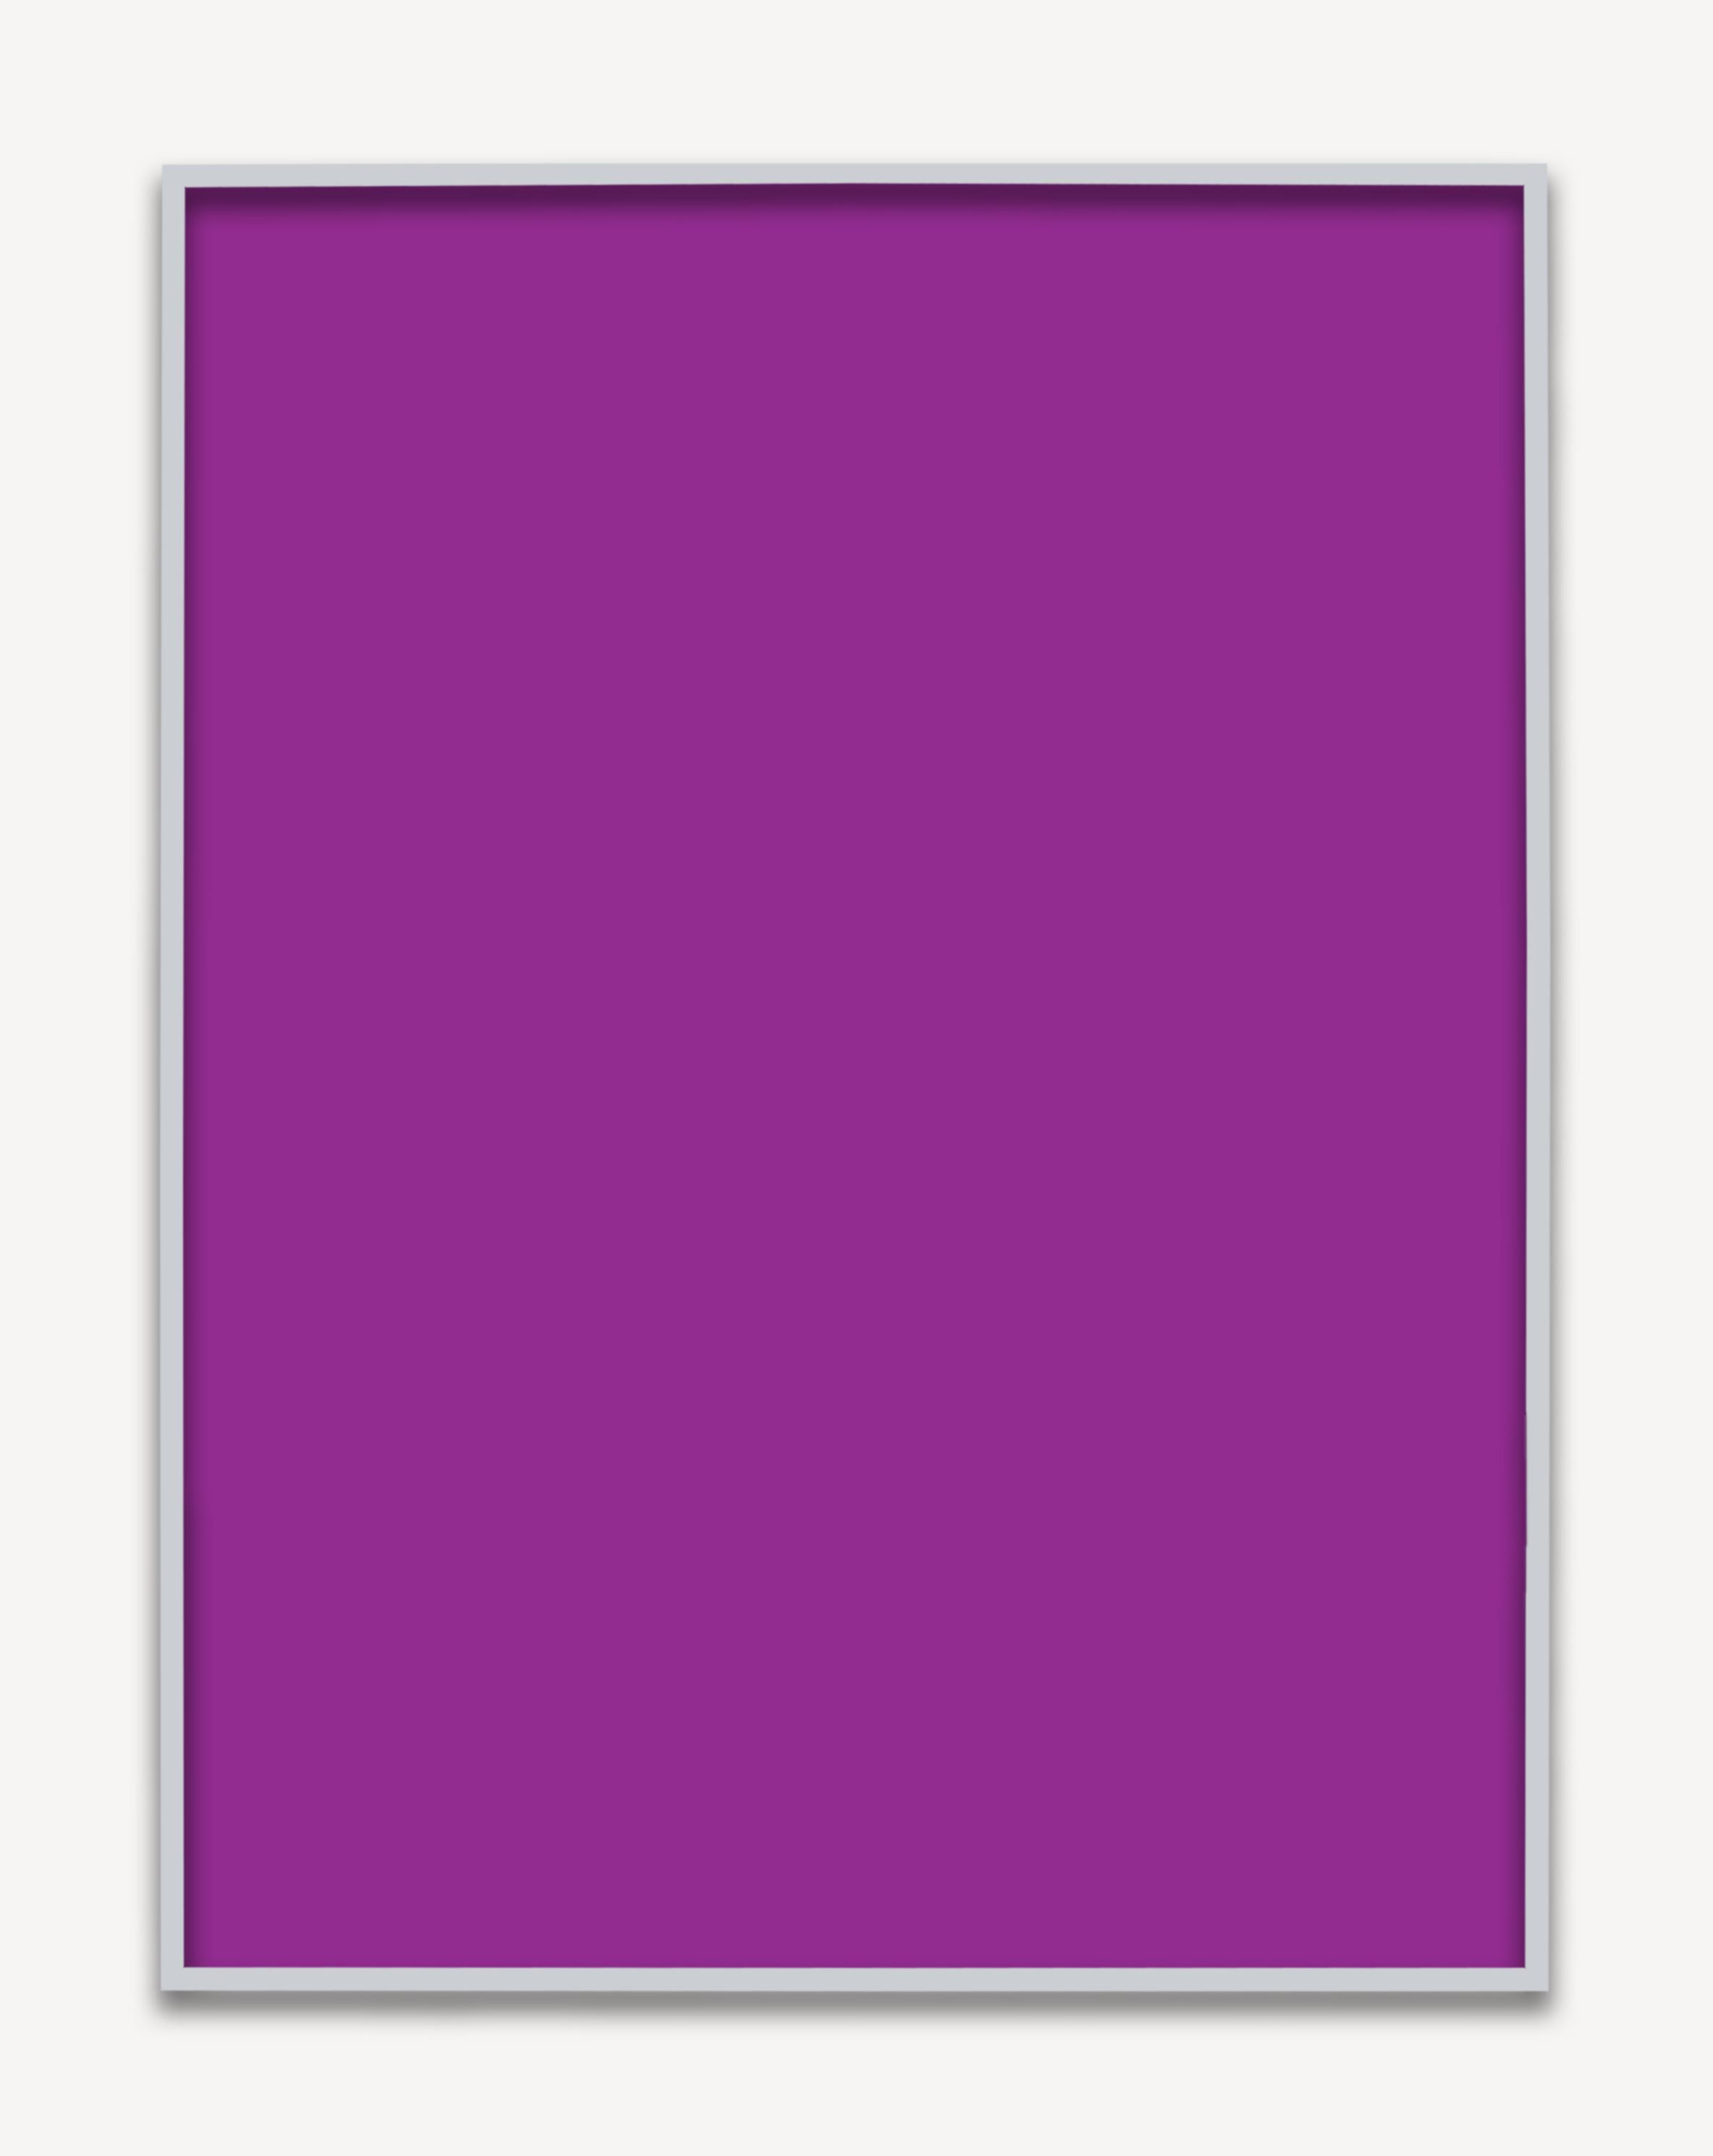 Untitled (Purple Monochrome), 2015 unique chromogenic print 153,5 x 123,5 cm - 60 3/8 x 45 5/8 inches (framed)